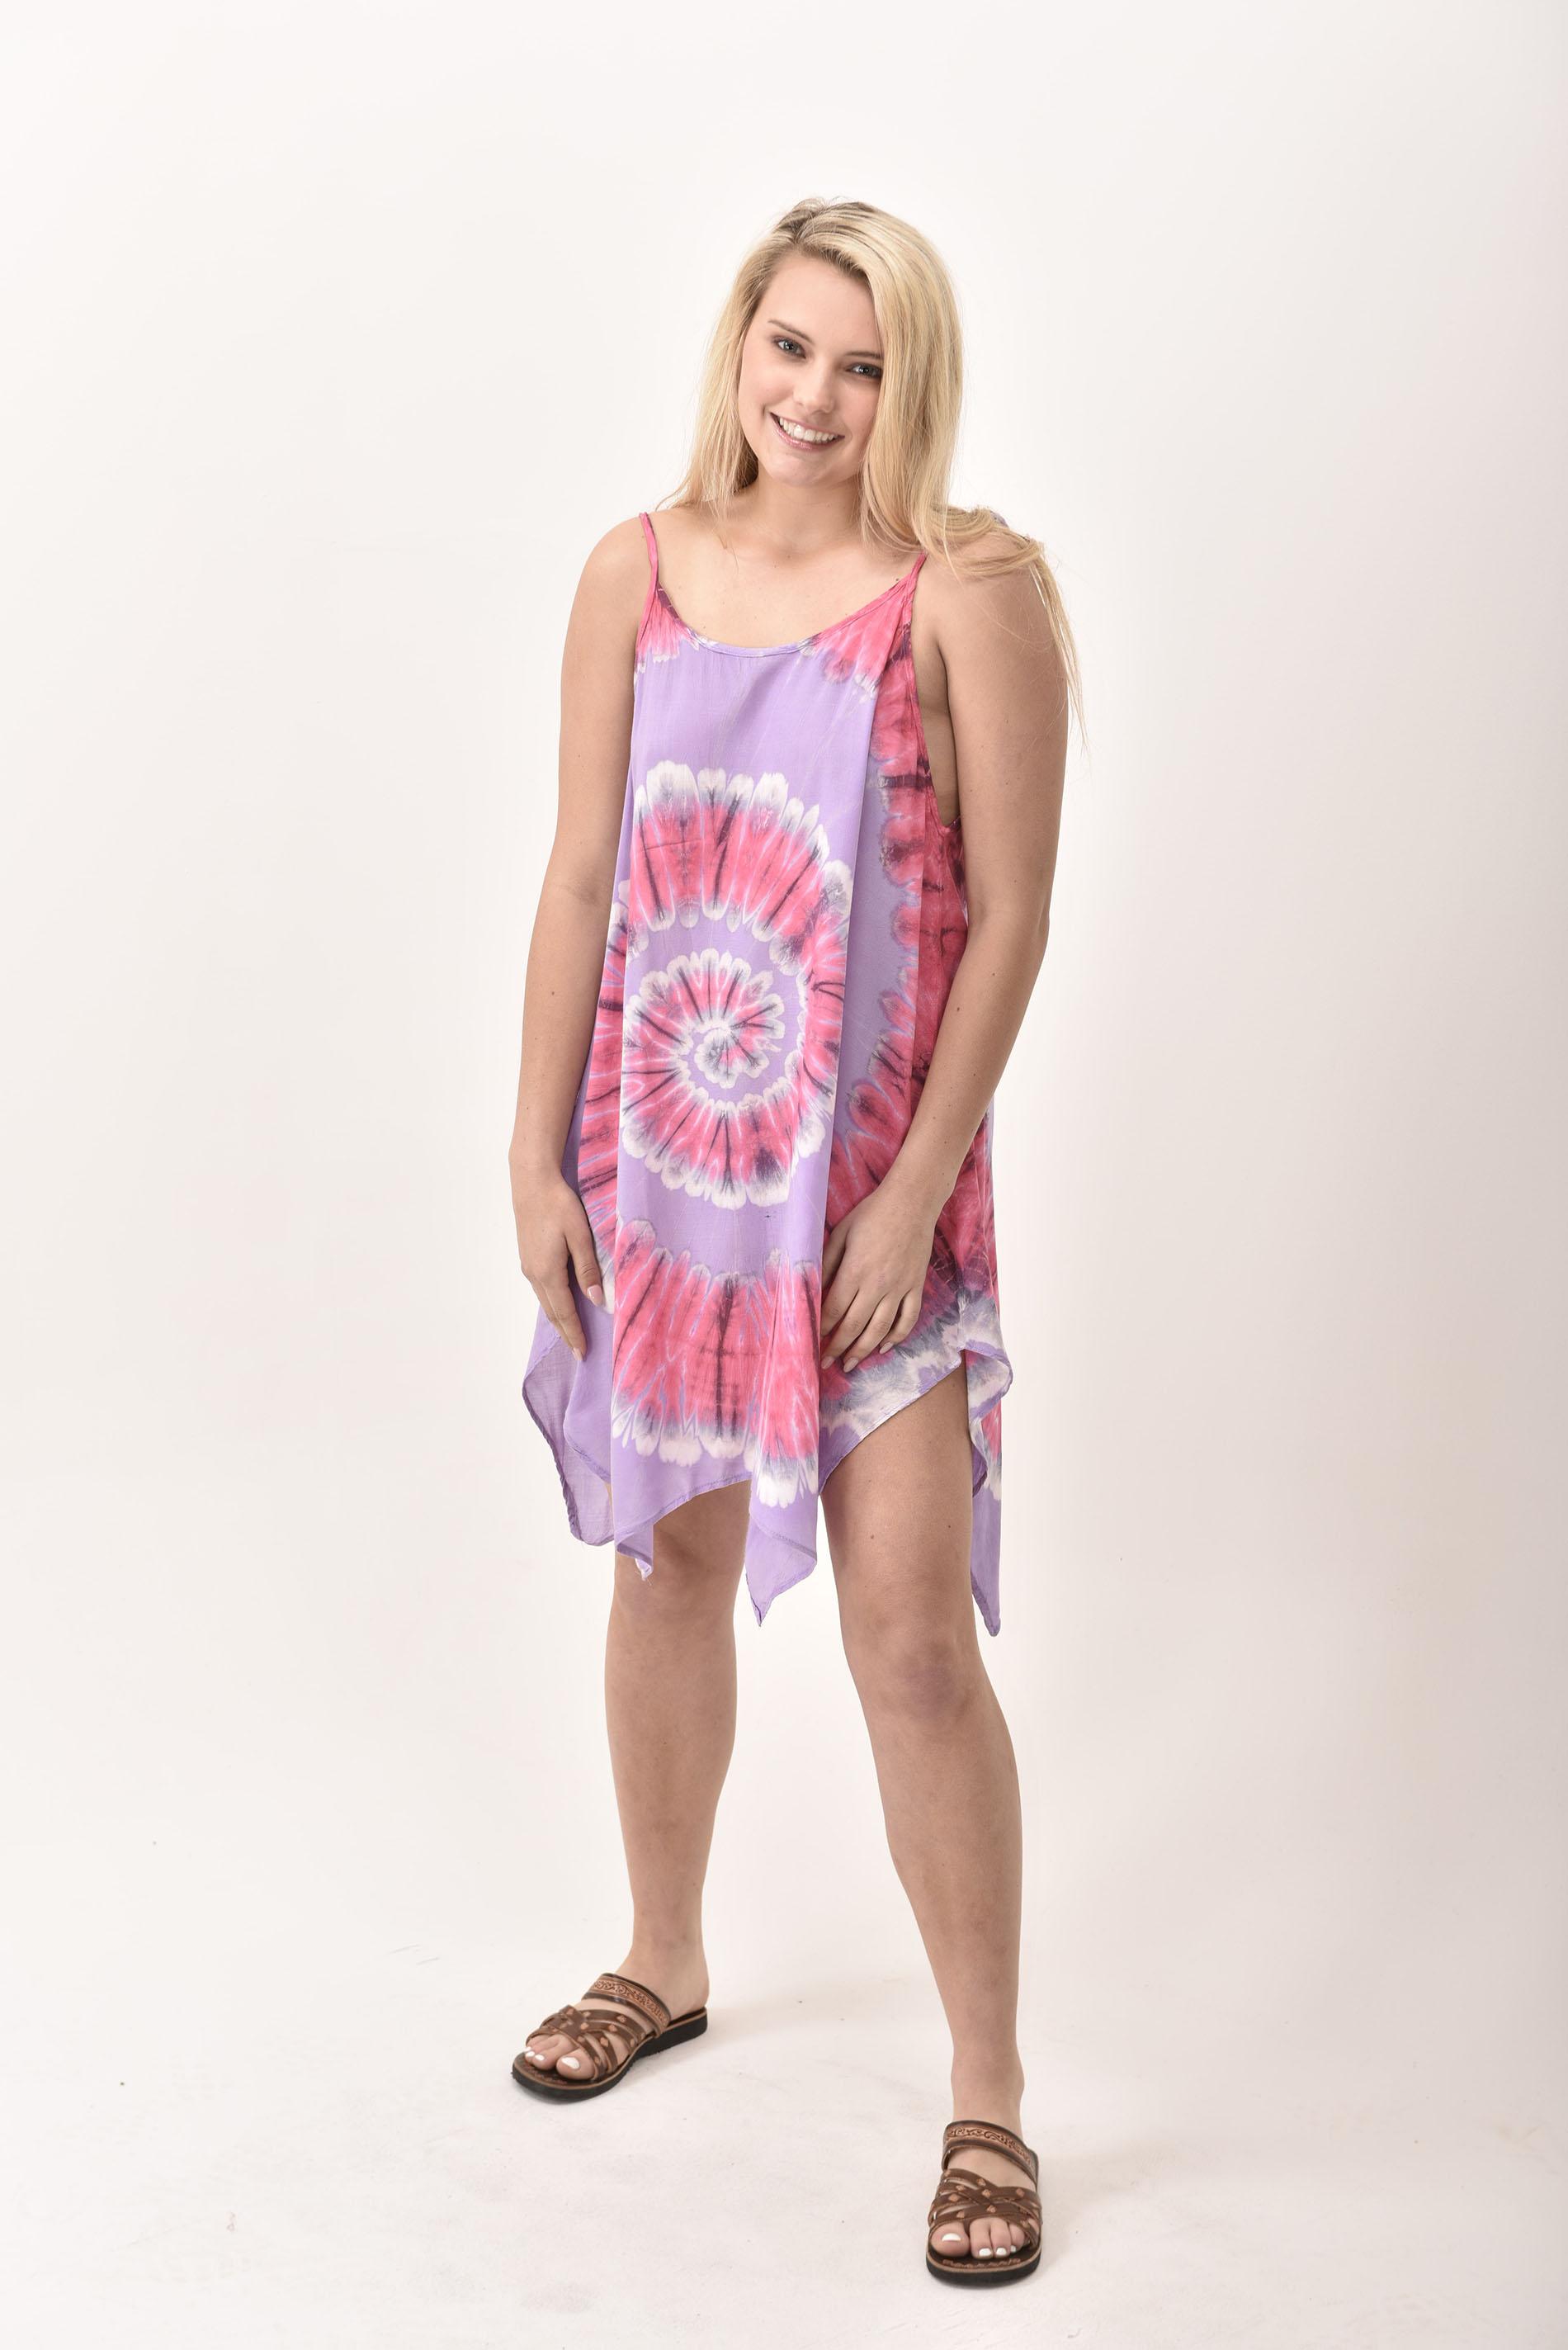 Fairy-Cut Dress, Hand Painted Tie Dye, Pink Lavender Multi